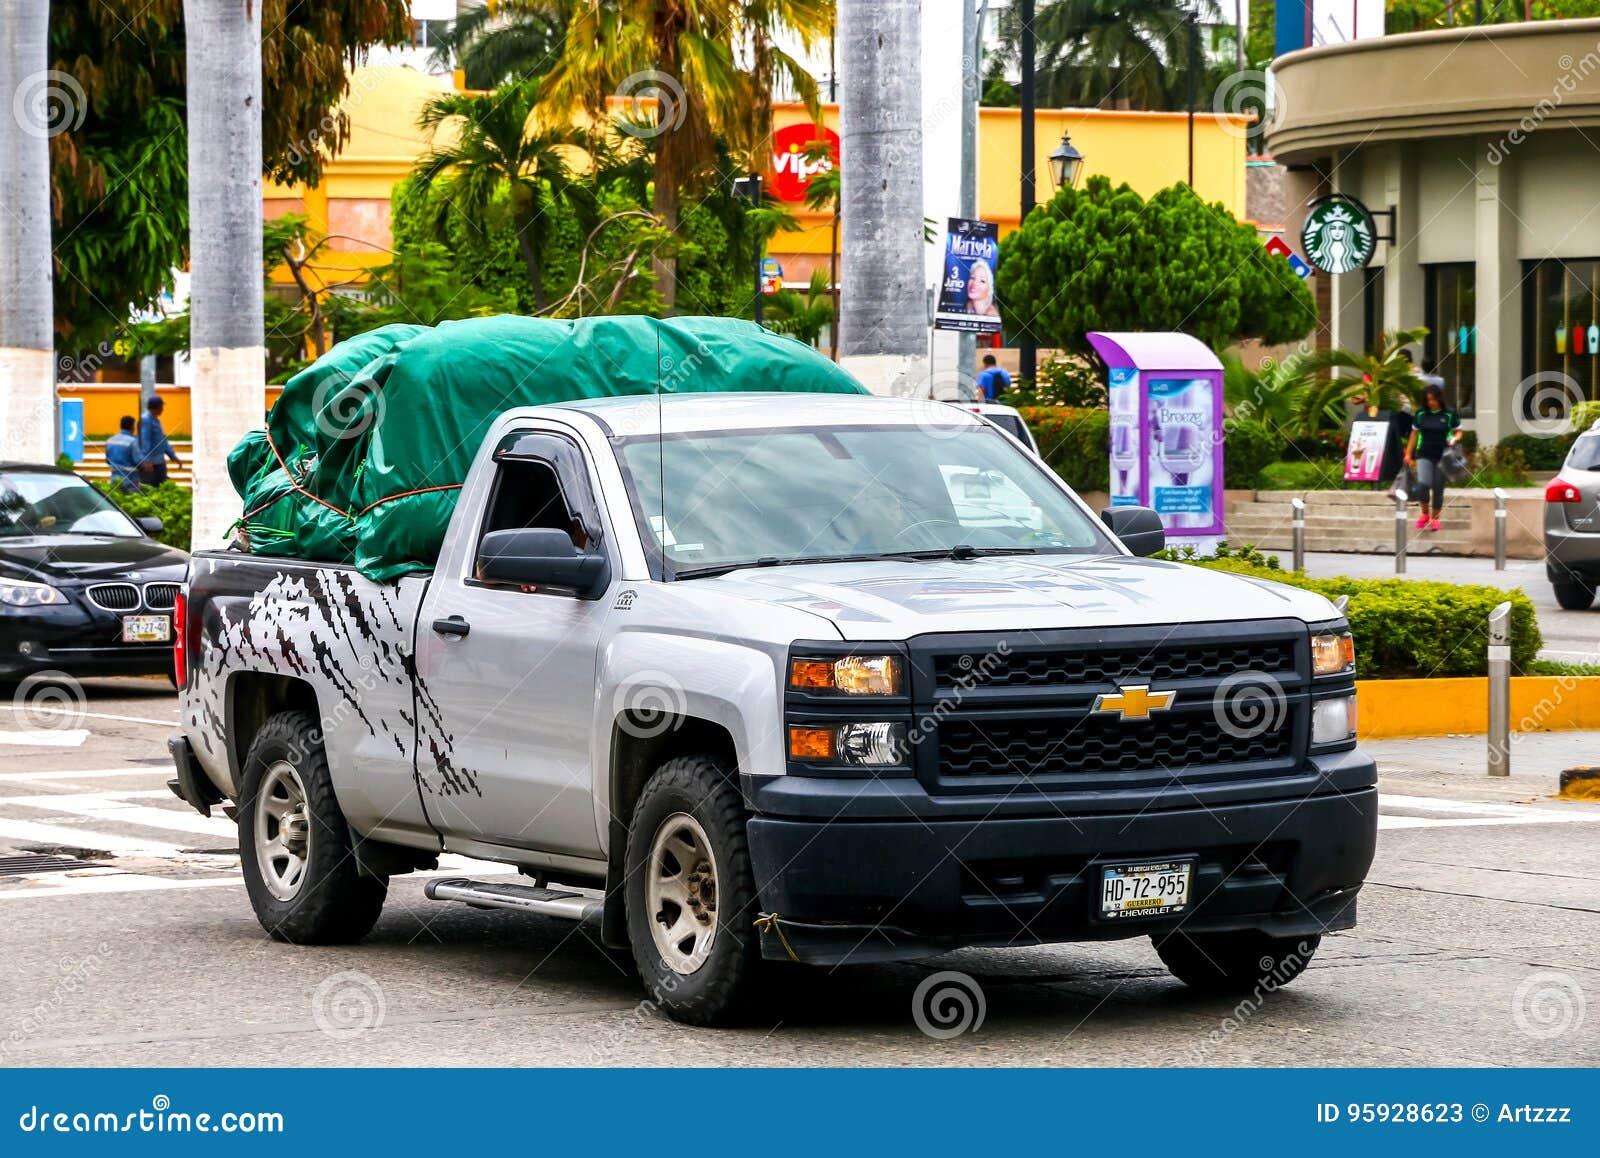 Chevrolet Cheyenne Editorial Stock Photo Image Of Hauling 95928623